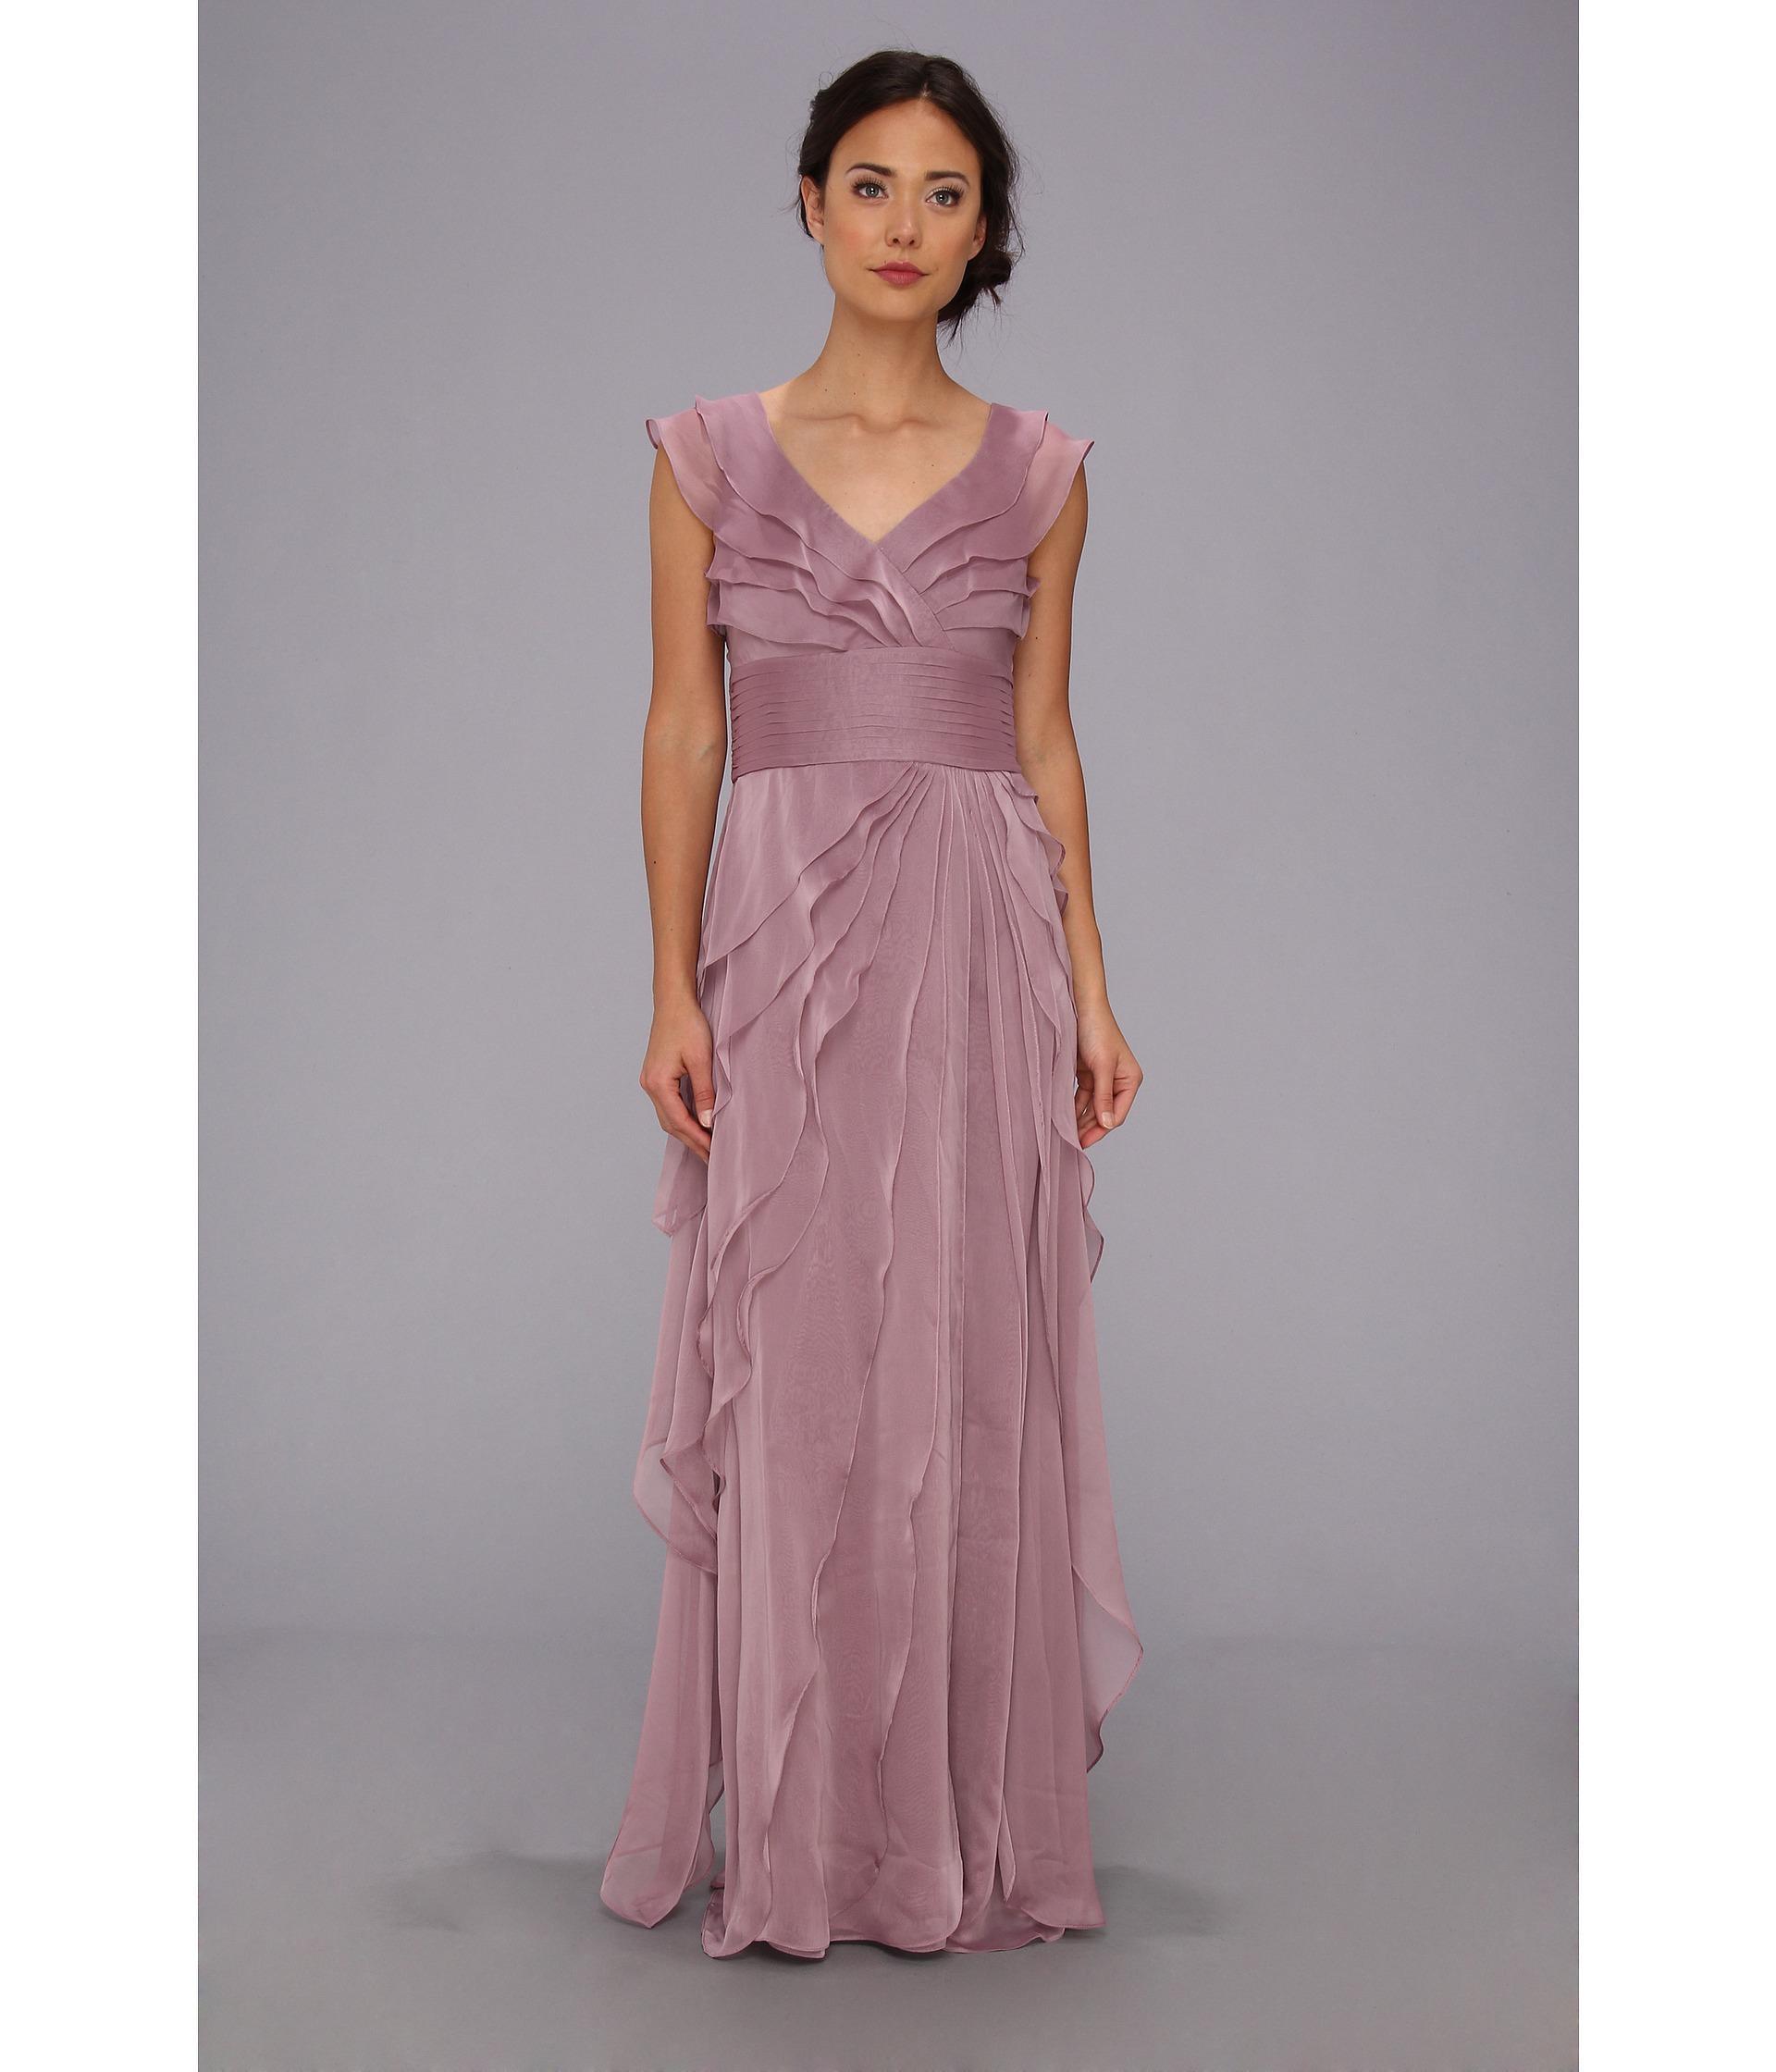 Lyst - Adrianna Papell Long Irri Tiered Petal Dress in Purple